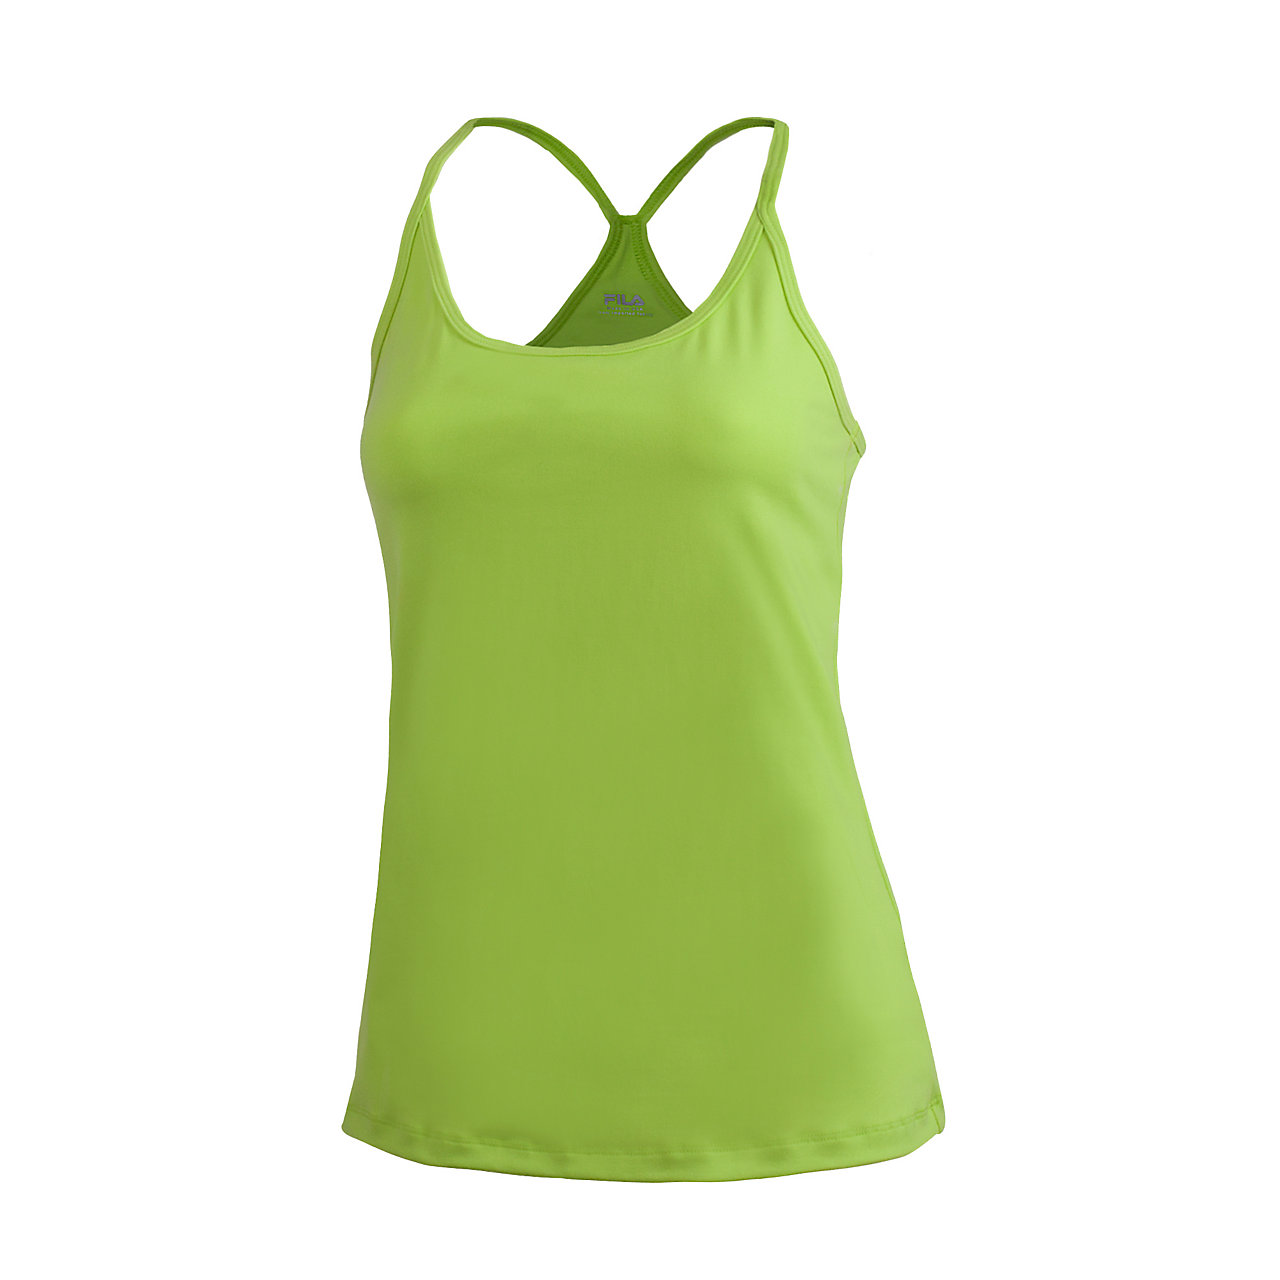 FILA-Women-039-s-Hot-Yoga-Cami-Tank